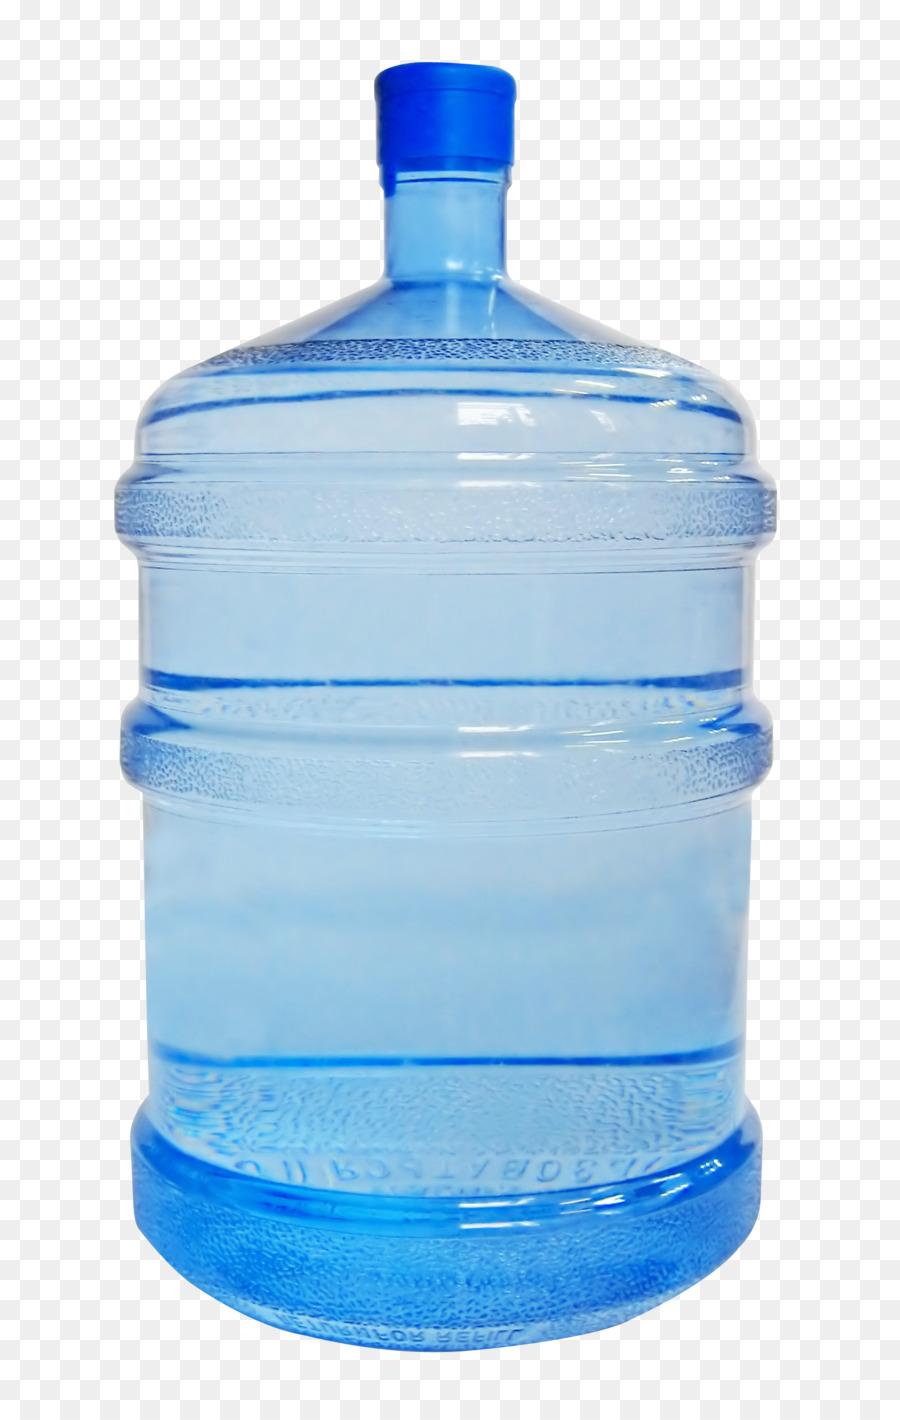 Descarga gratuita de Botella De Agua, Agua Mineral, Agua imágenes PNG